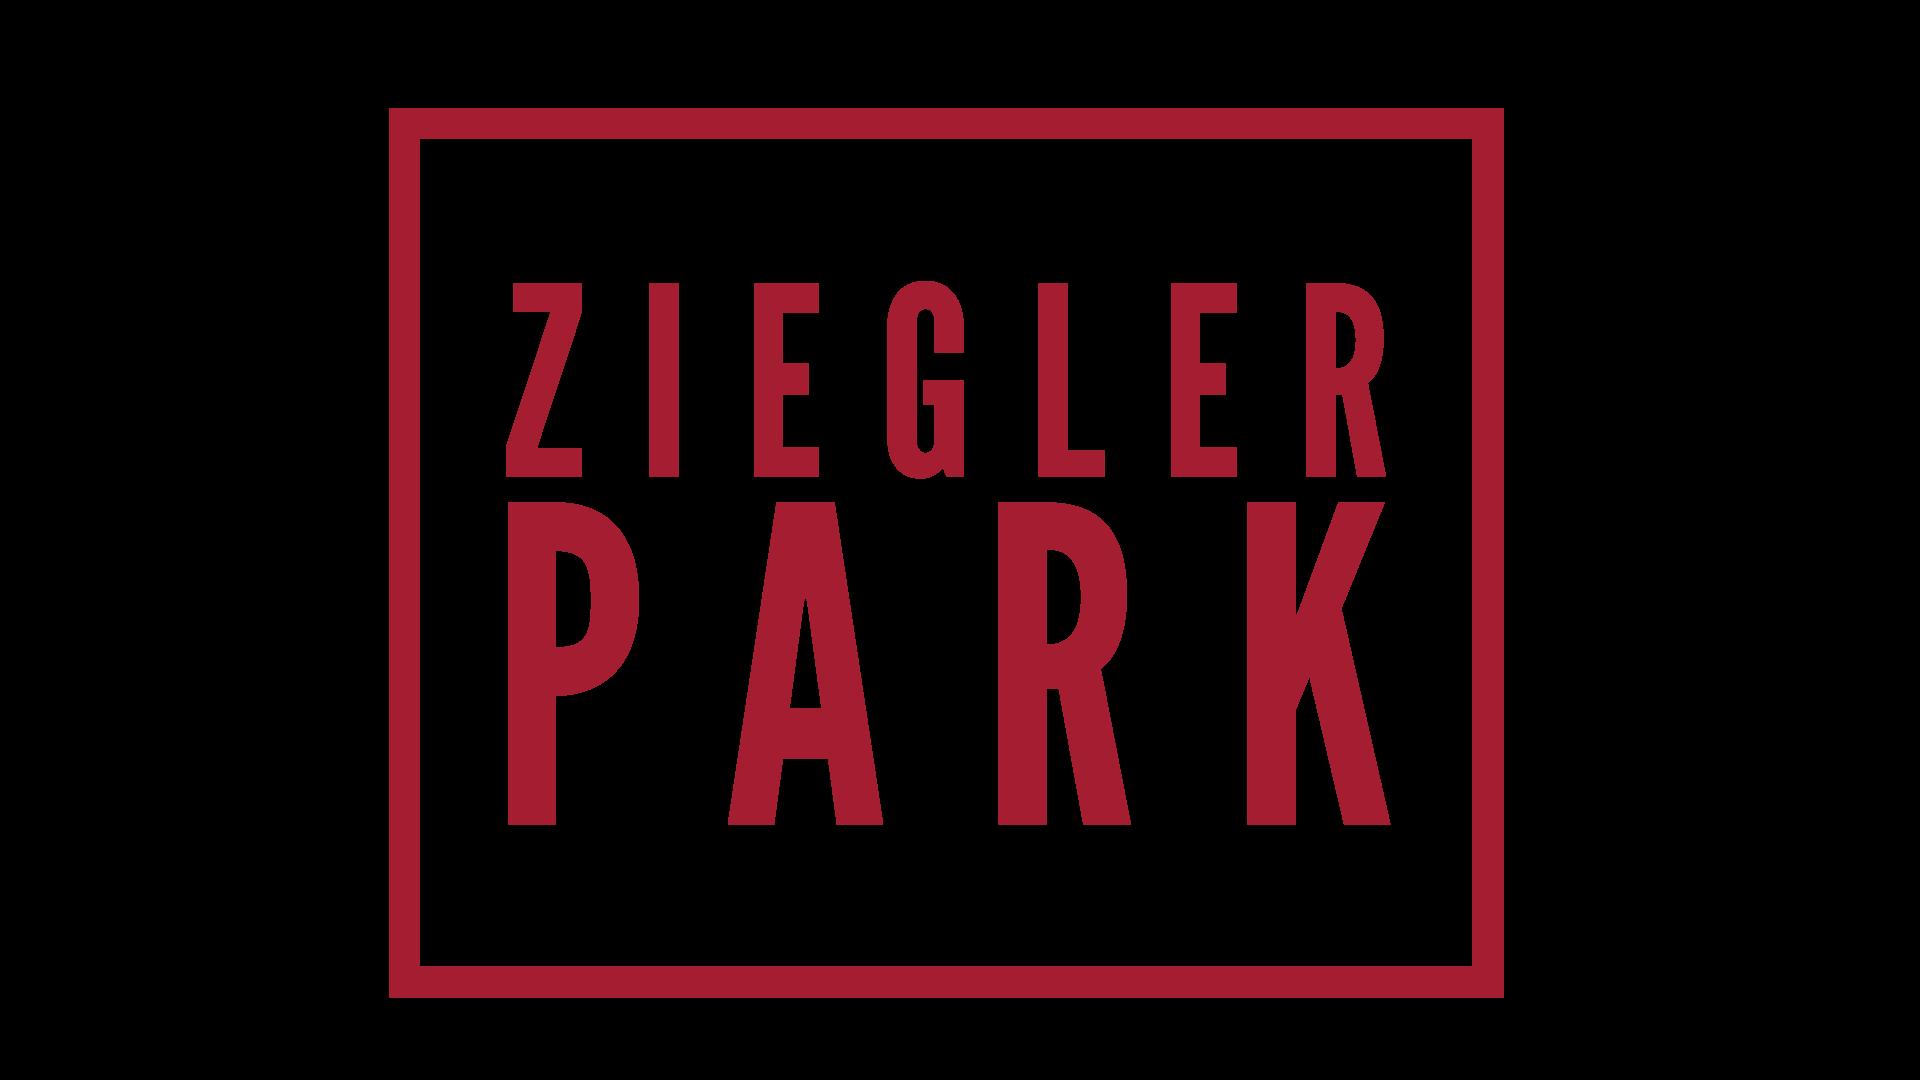 https://gocsl.com/wp-content/uploads/2020/11/ZieglerPark.png